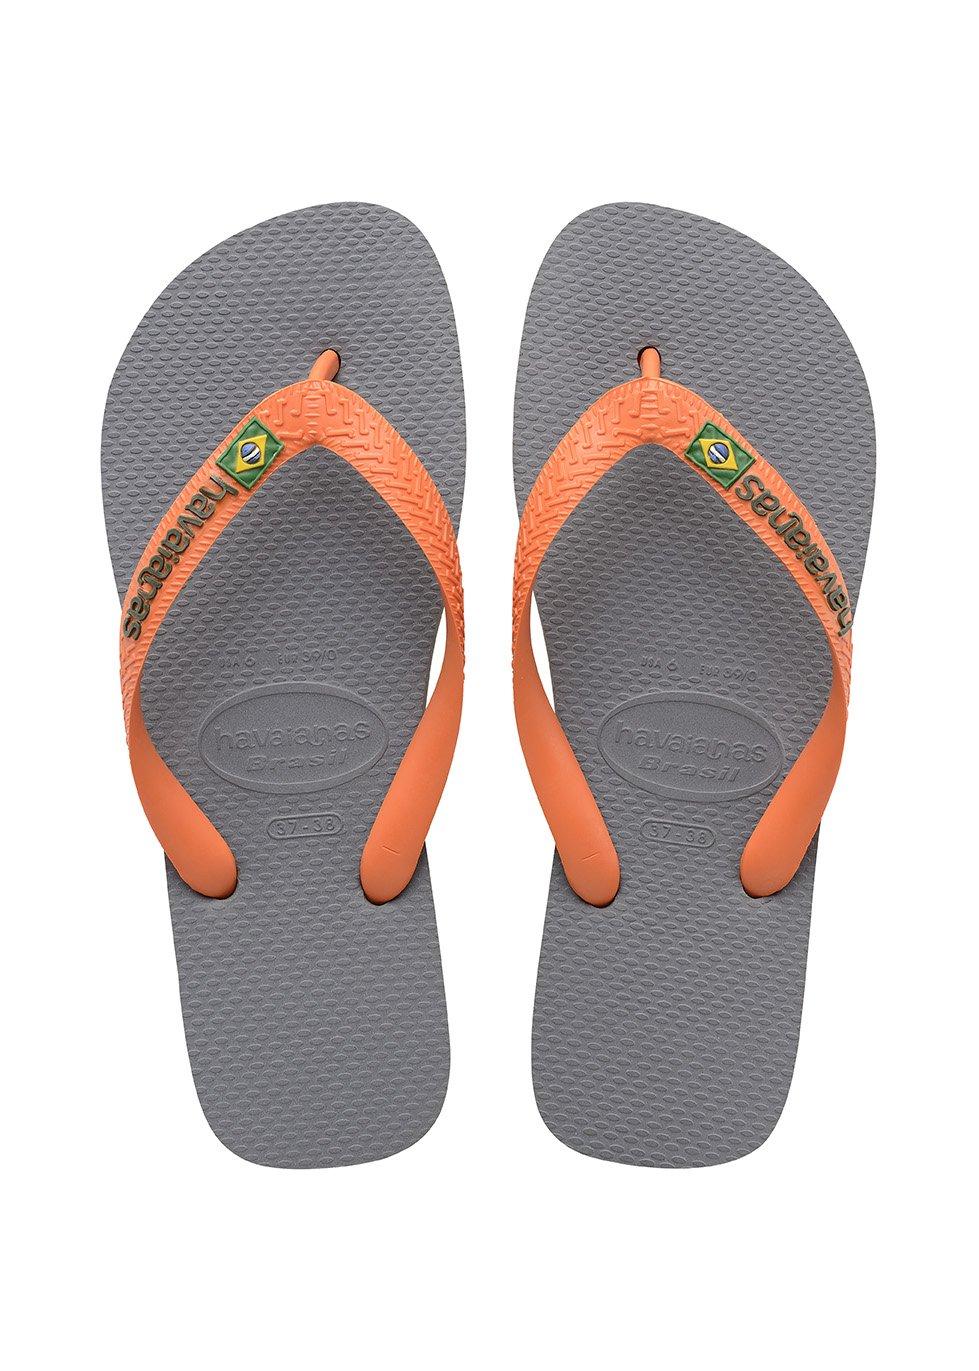 7f9627cf5 Galleon - Havaianas Brasil Logo Unisex Adult s Flip Flops